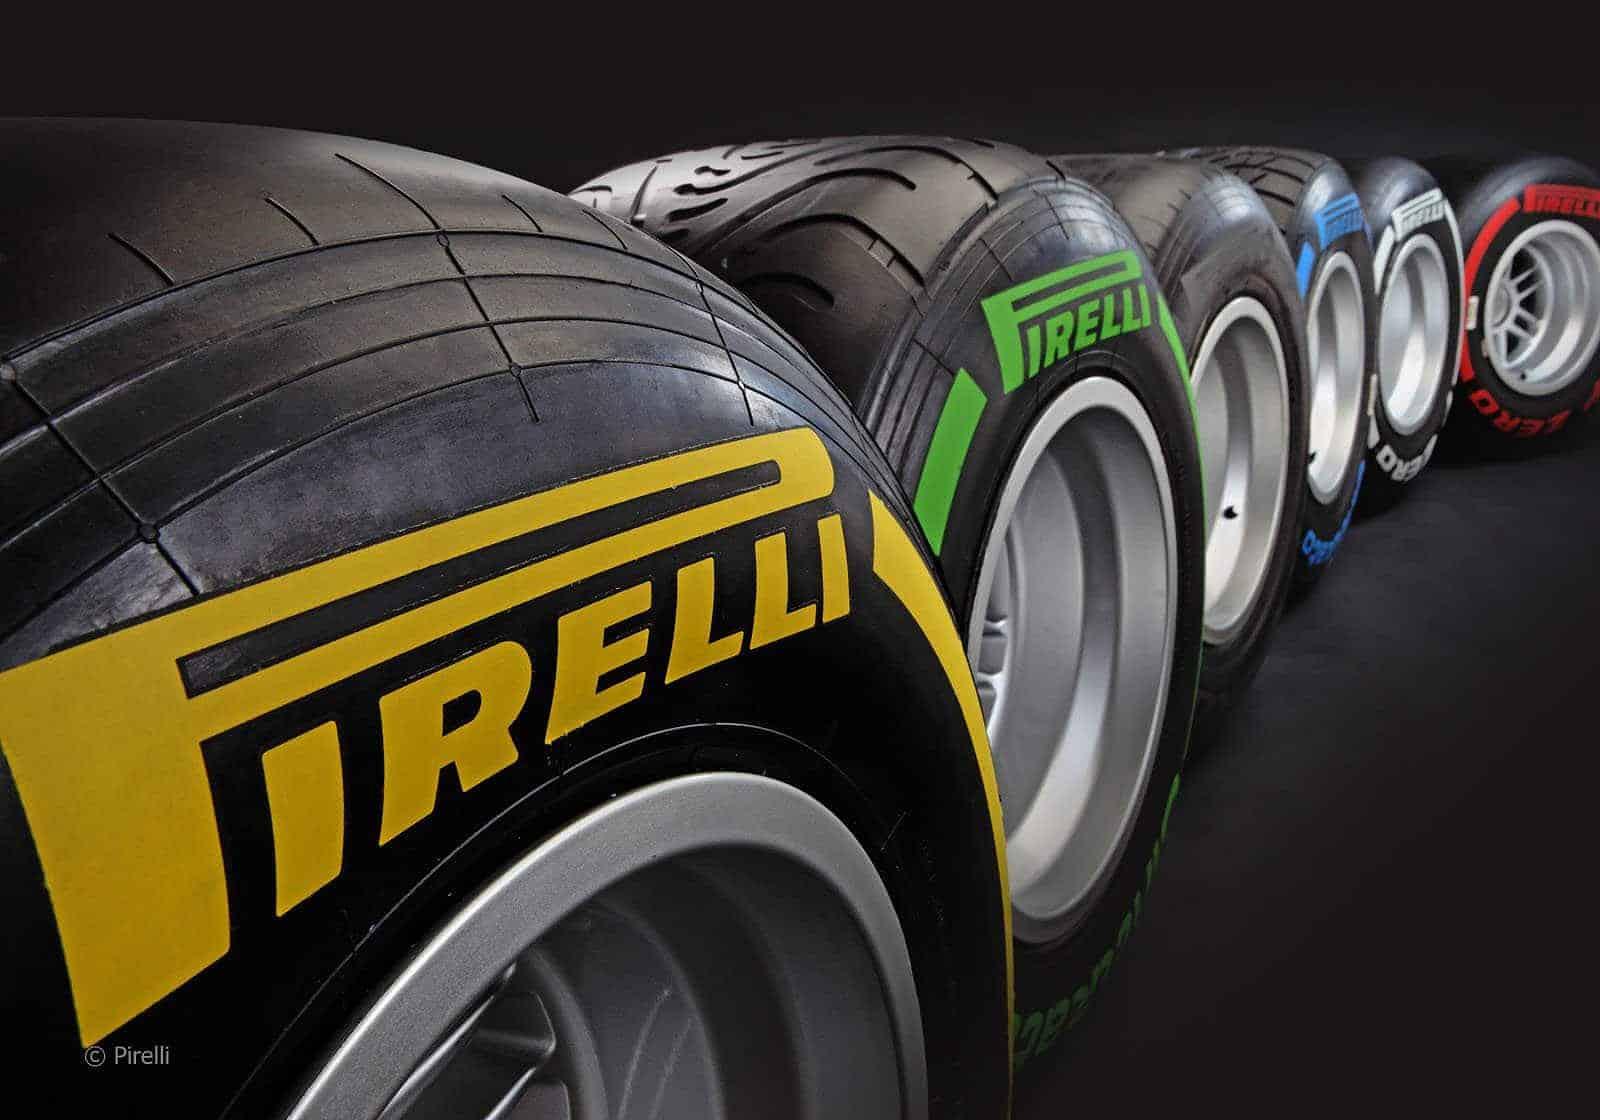 Pirelli tyres, tires, in the studio (credit: Pirelli)